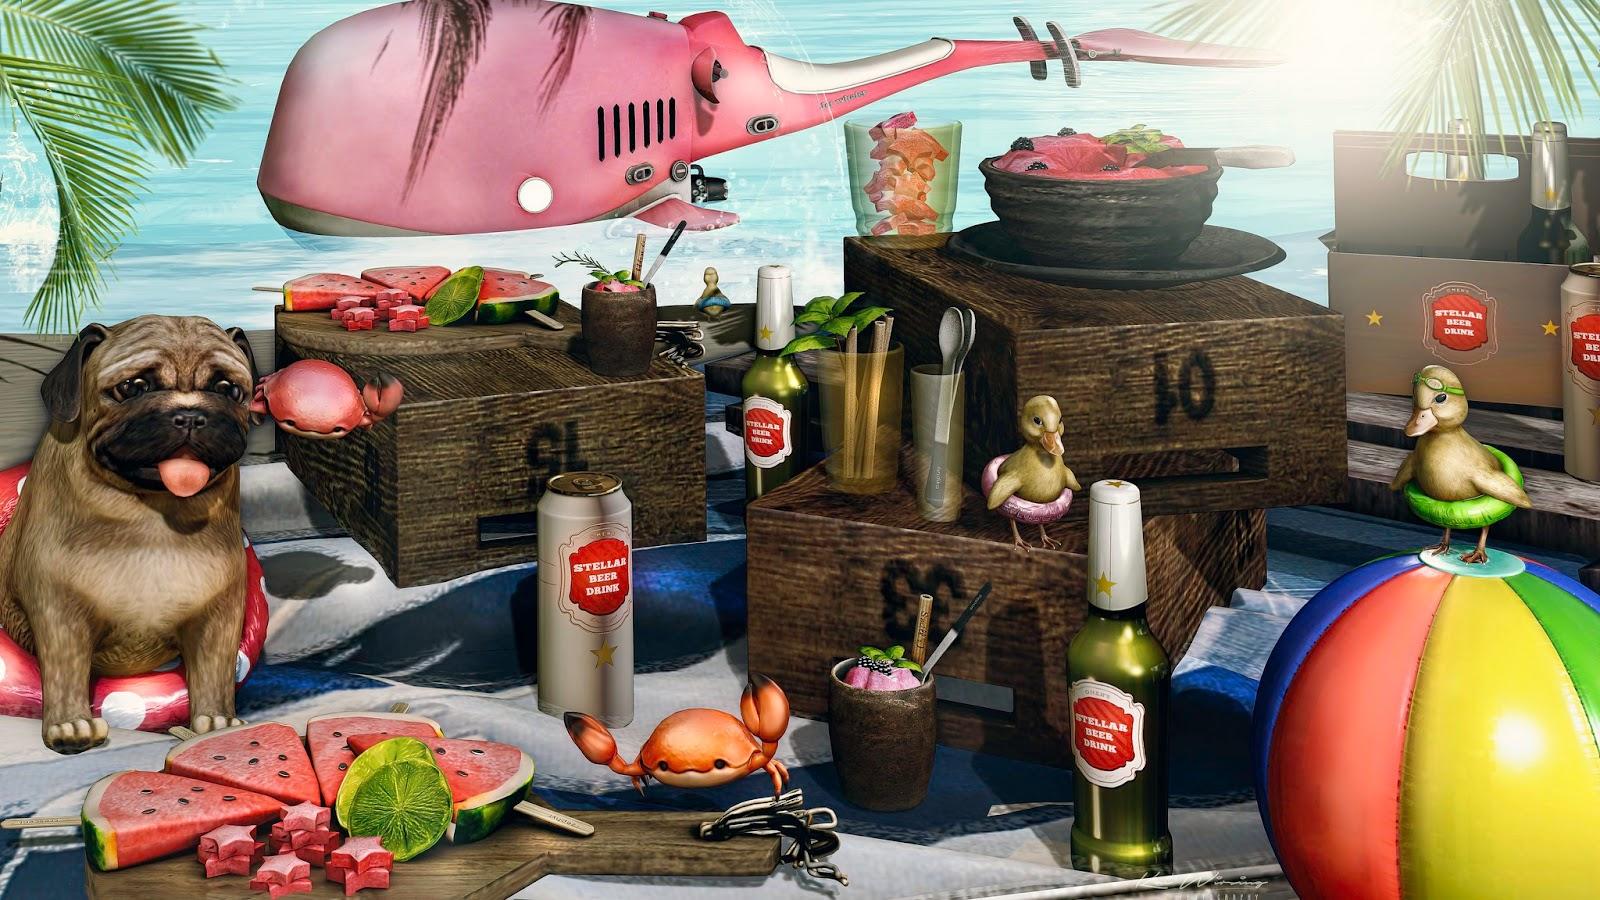 andika[loisir Dispenser set] @Summerfest '20 / D-LAB Jet whales @Summerfest '20